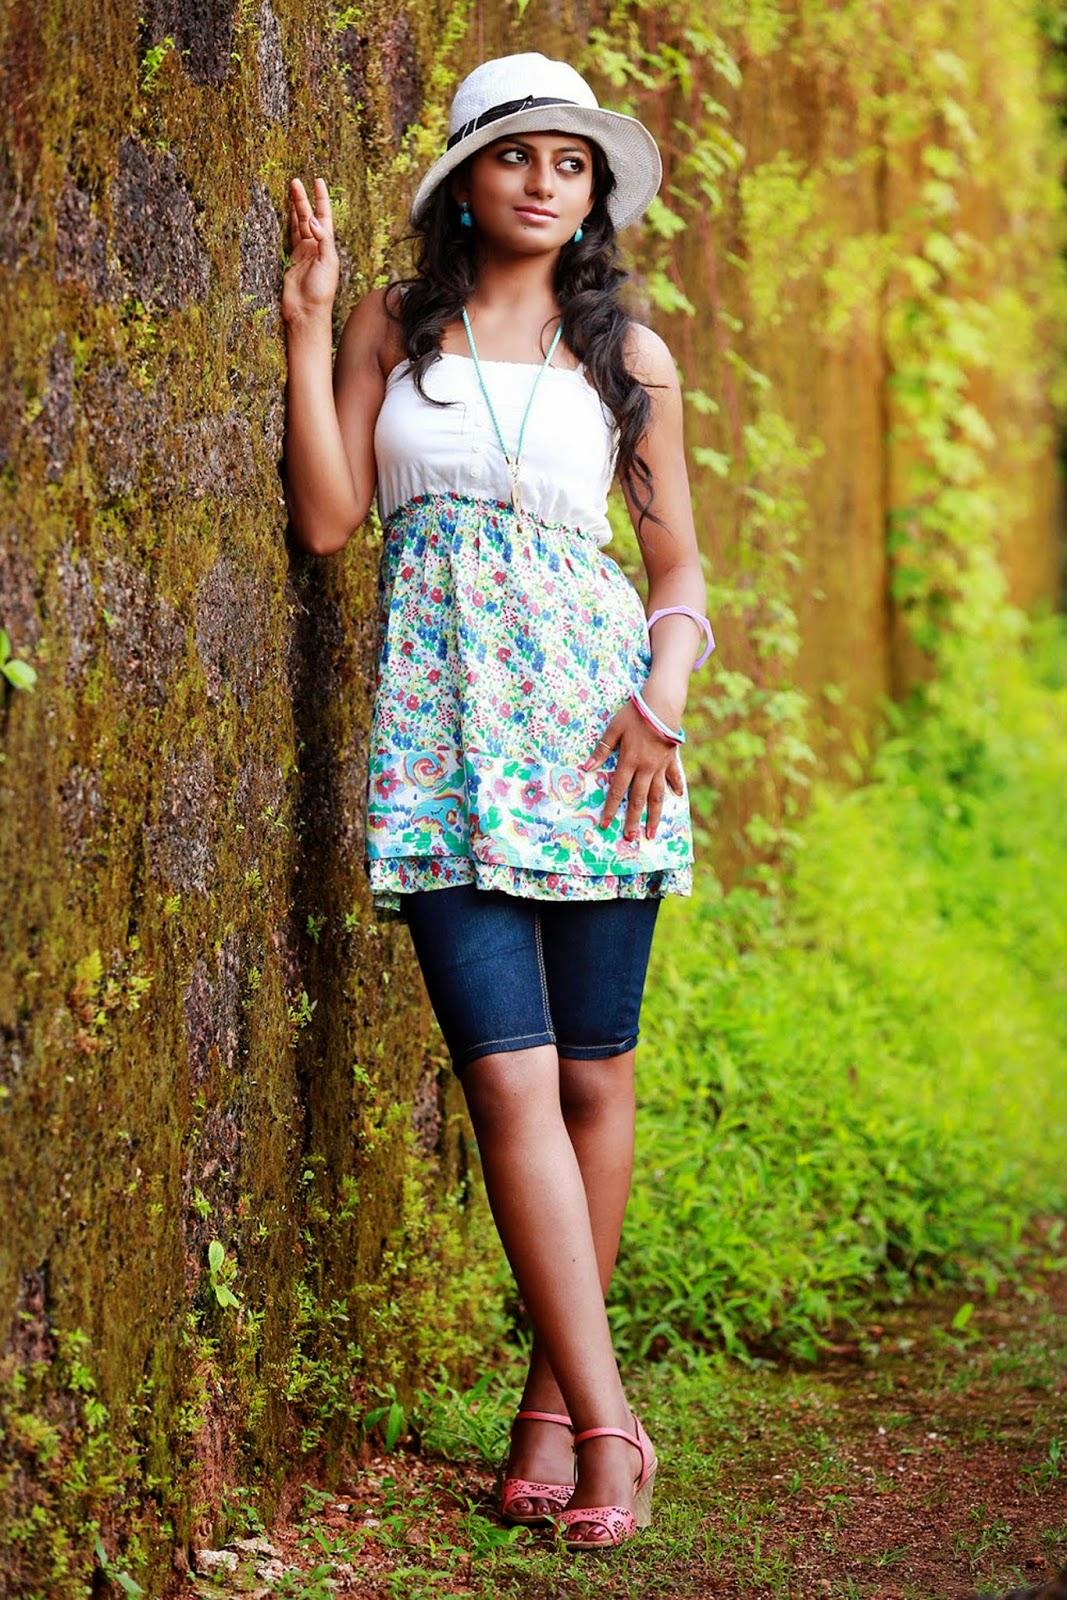 telugu heroine photos download